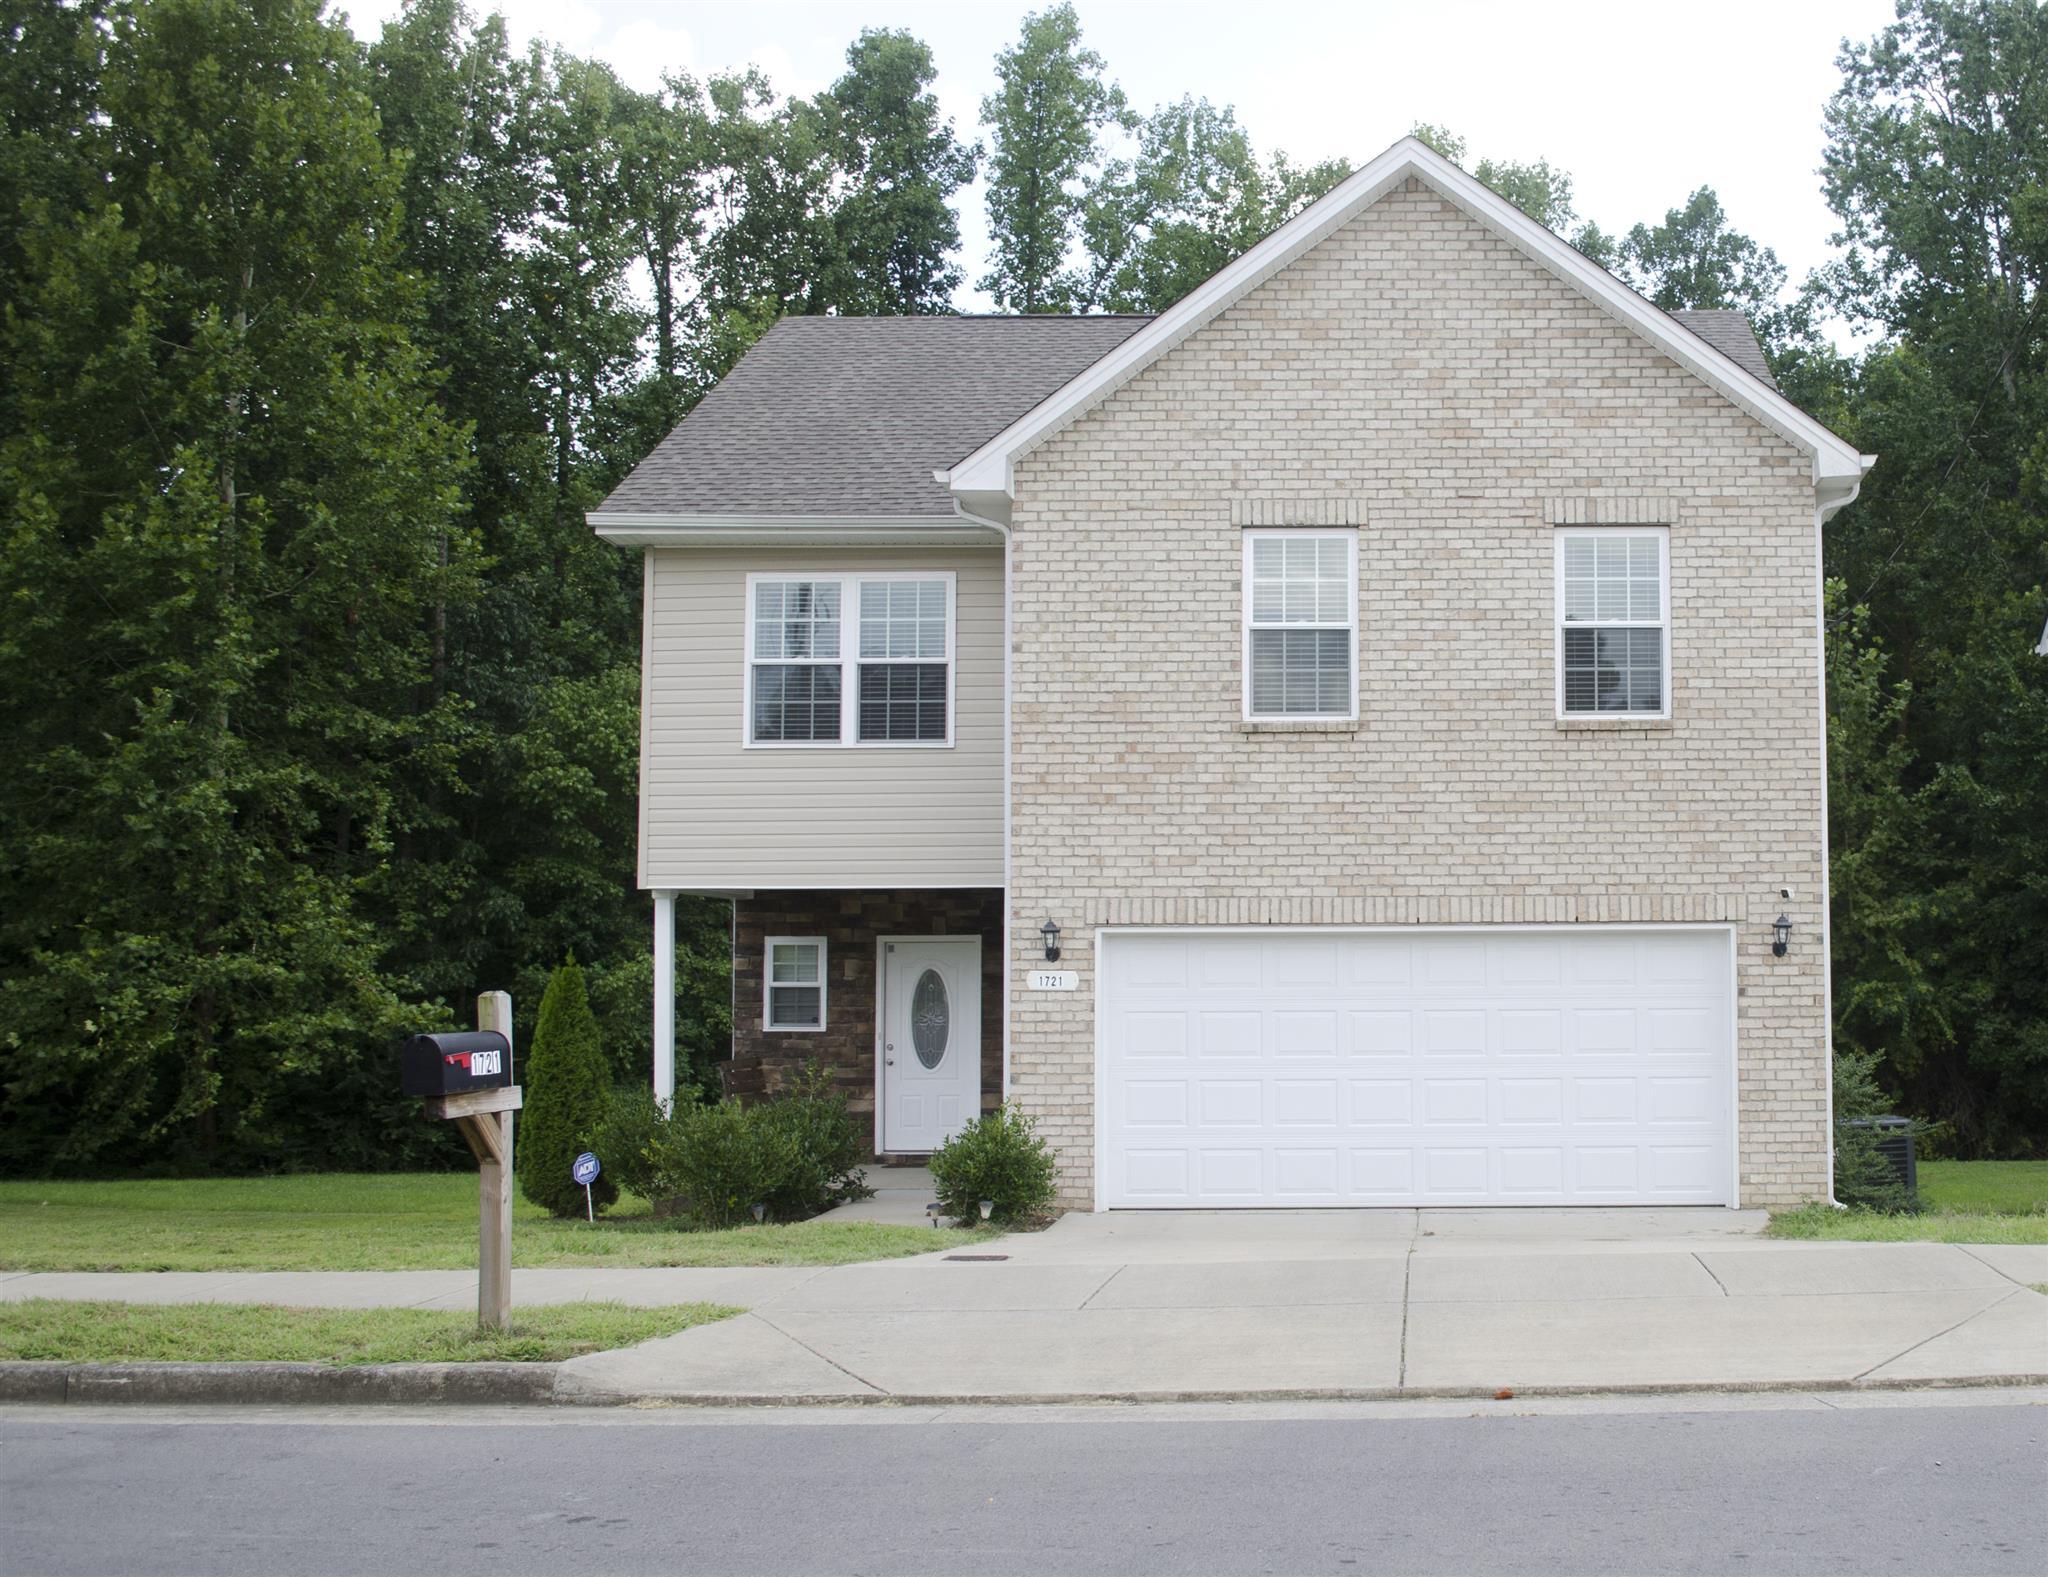 1721 Bridgecrest Dr, Antioch, TN 37013 - Antioch, TN real estate listing